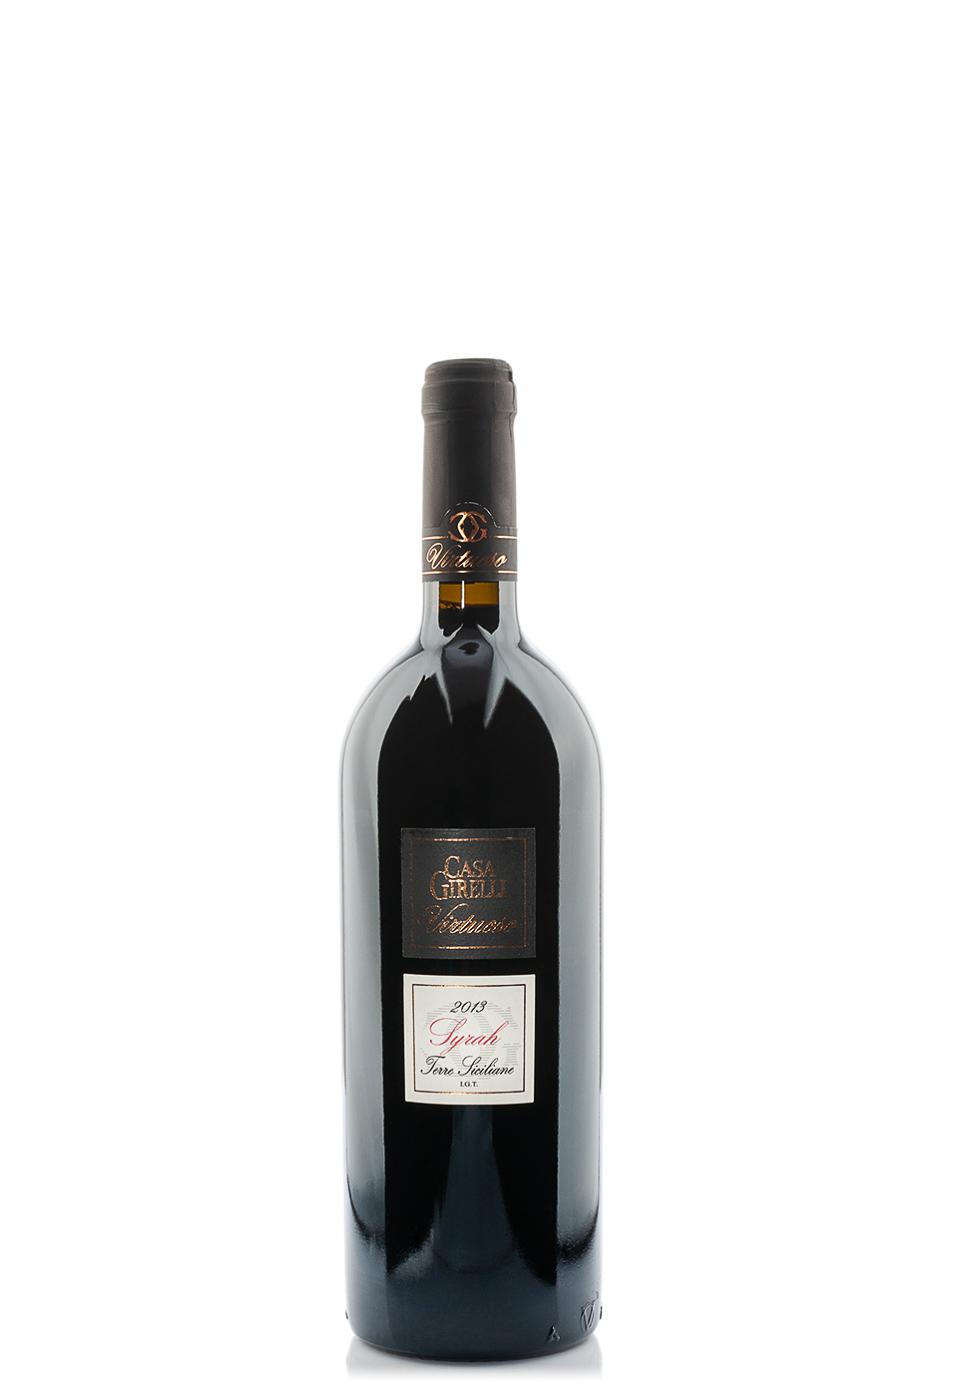 Vin Casa Girelli, Virtuoso, IGT Sicilia, Syrah 2014 (0.75L)